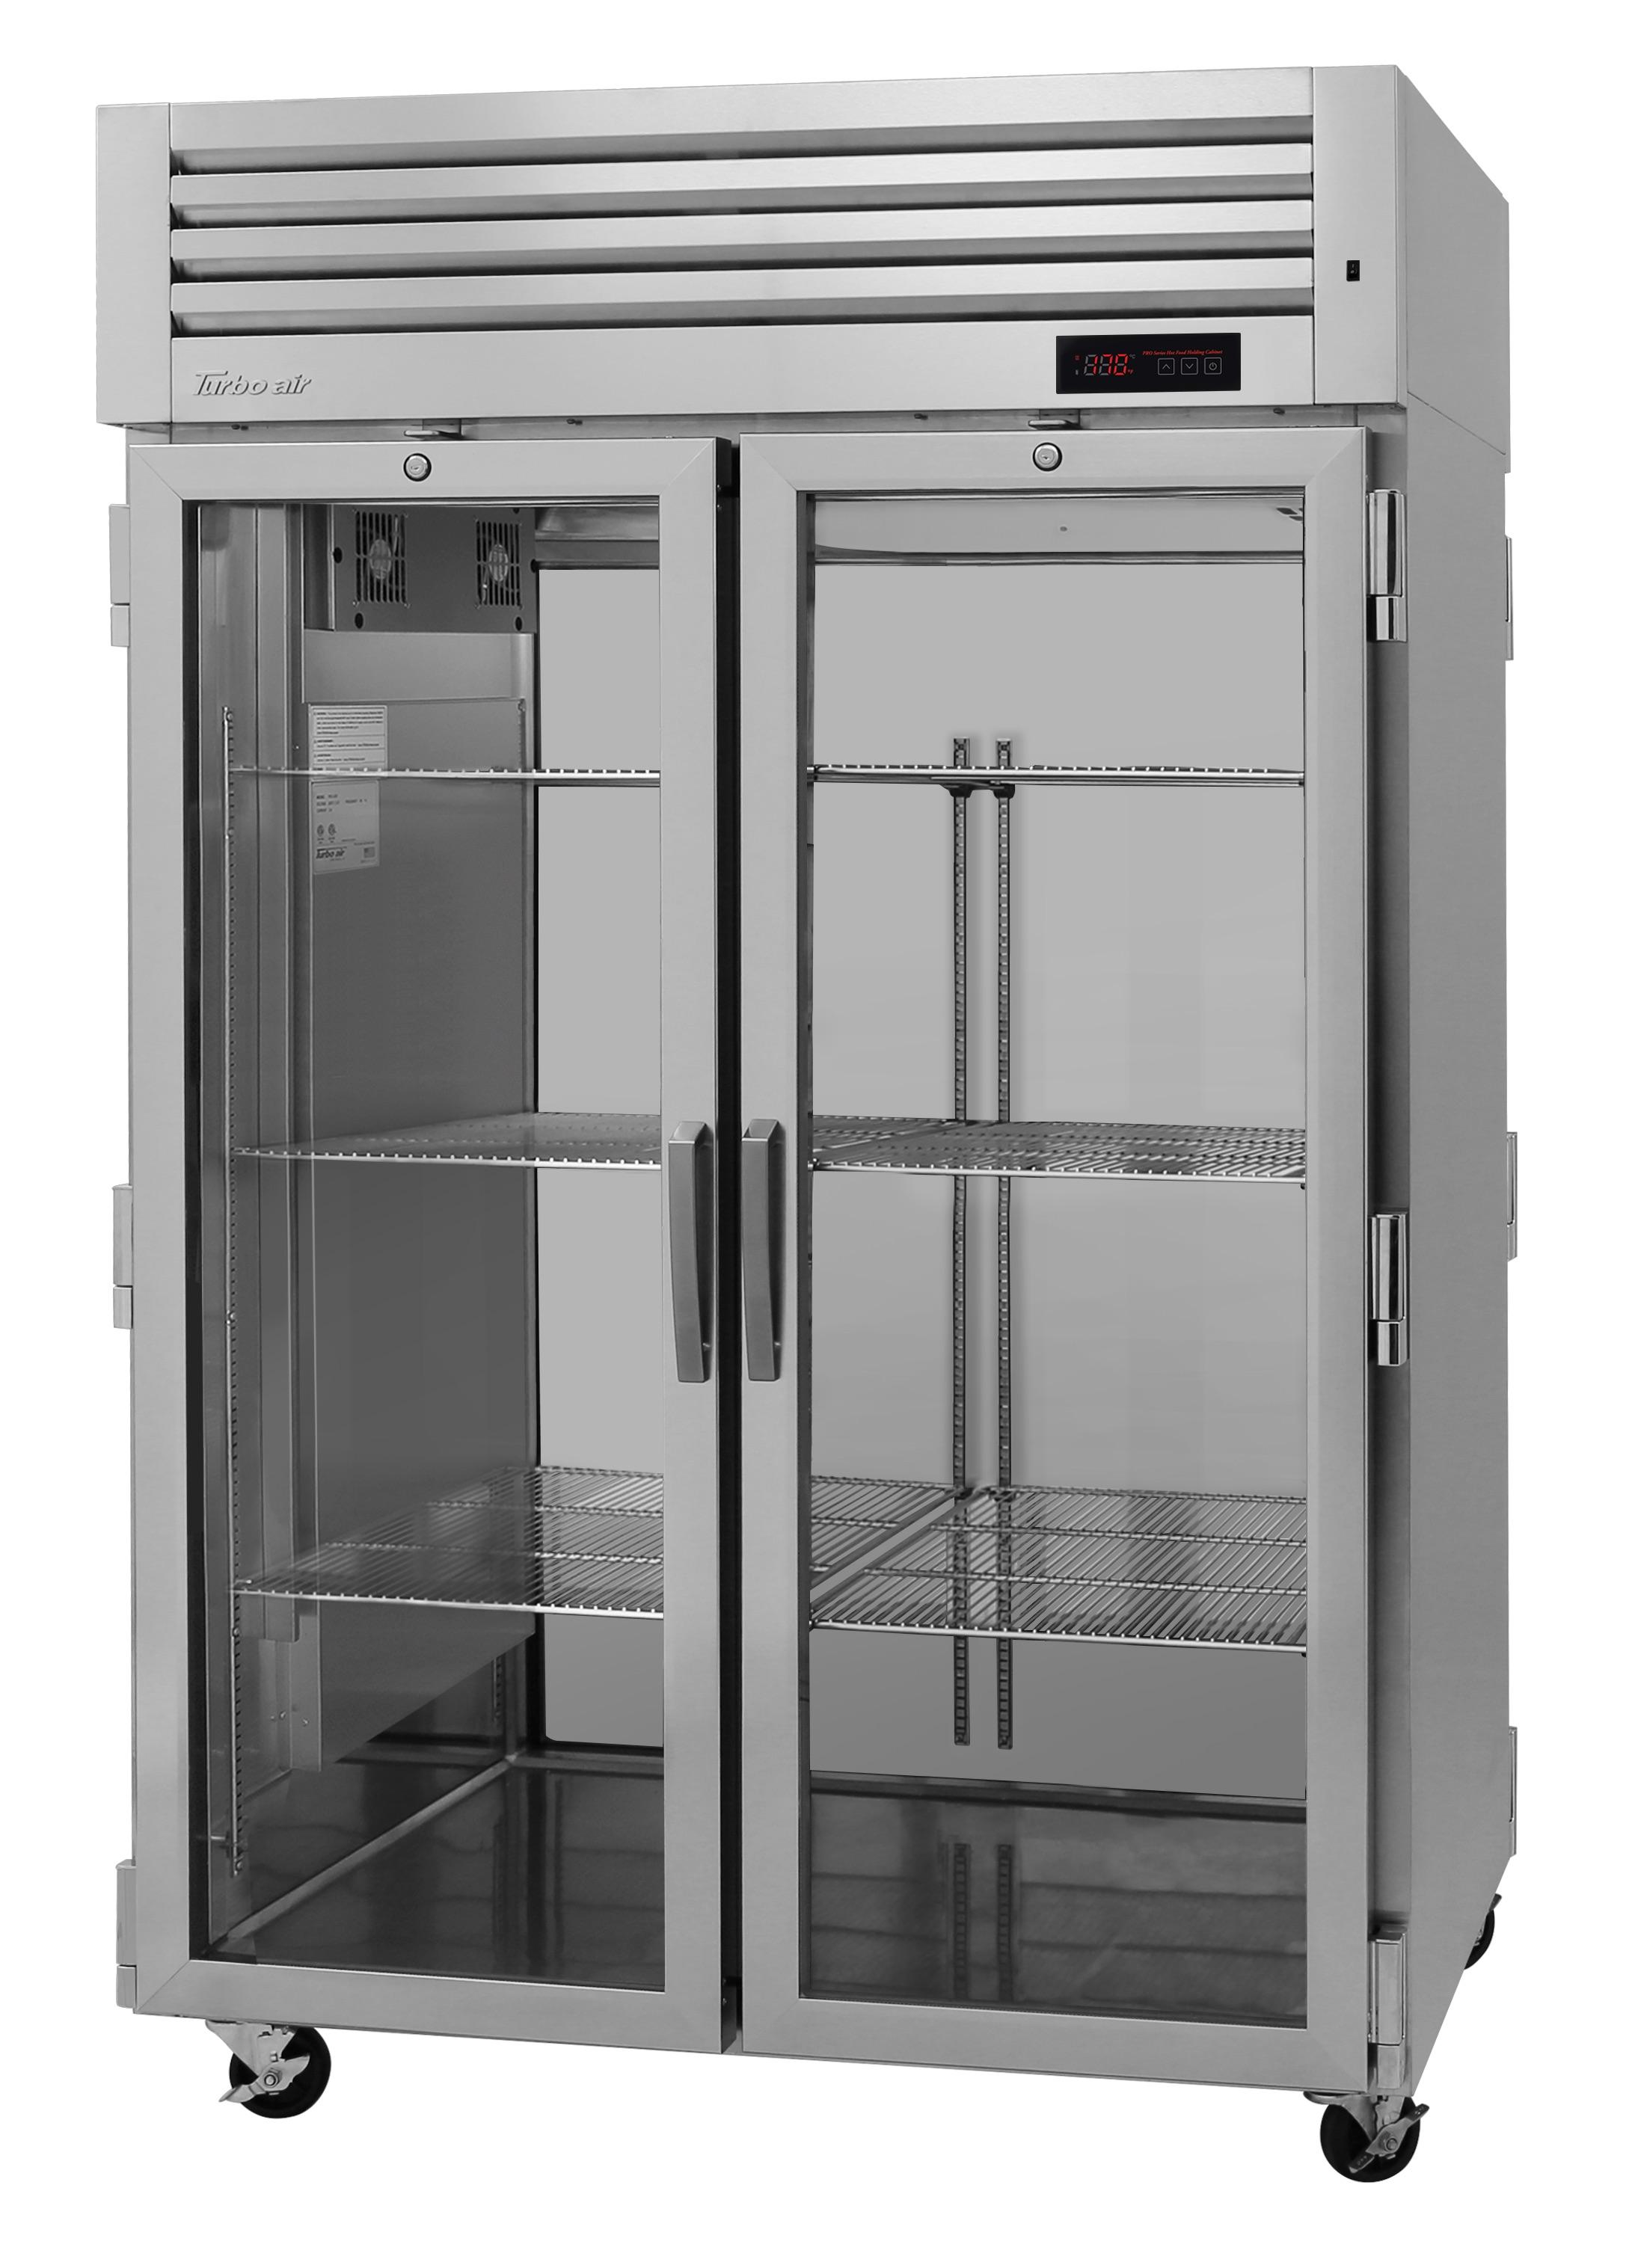 Turbo Air PRO-50H-G pro series - reach in refrigerator